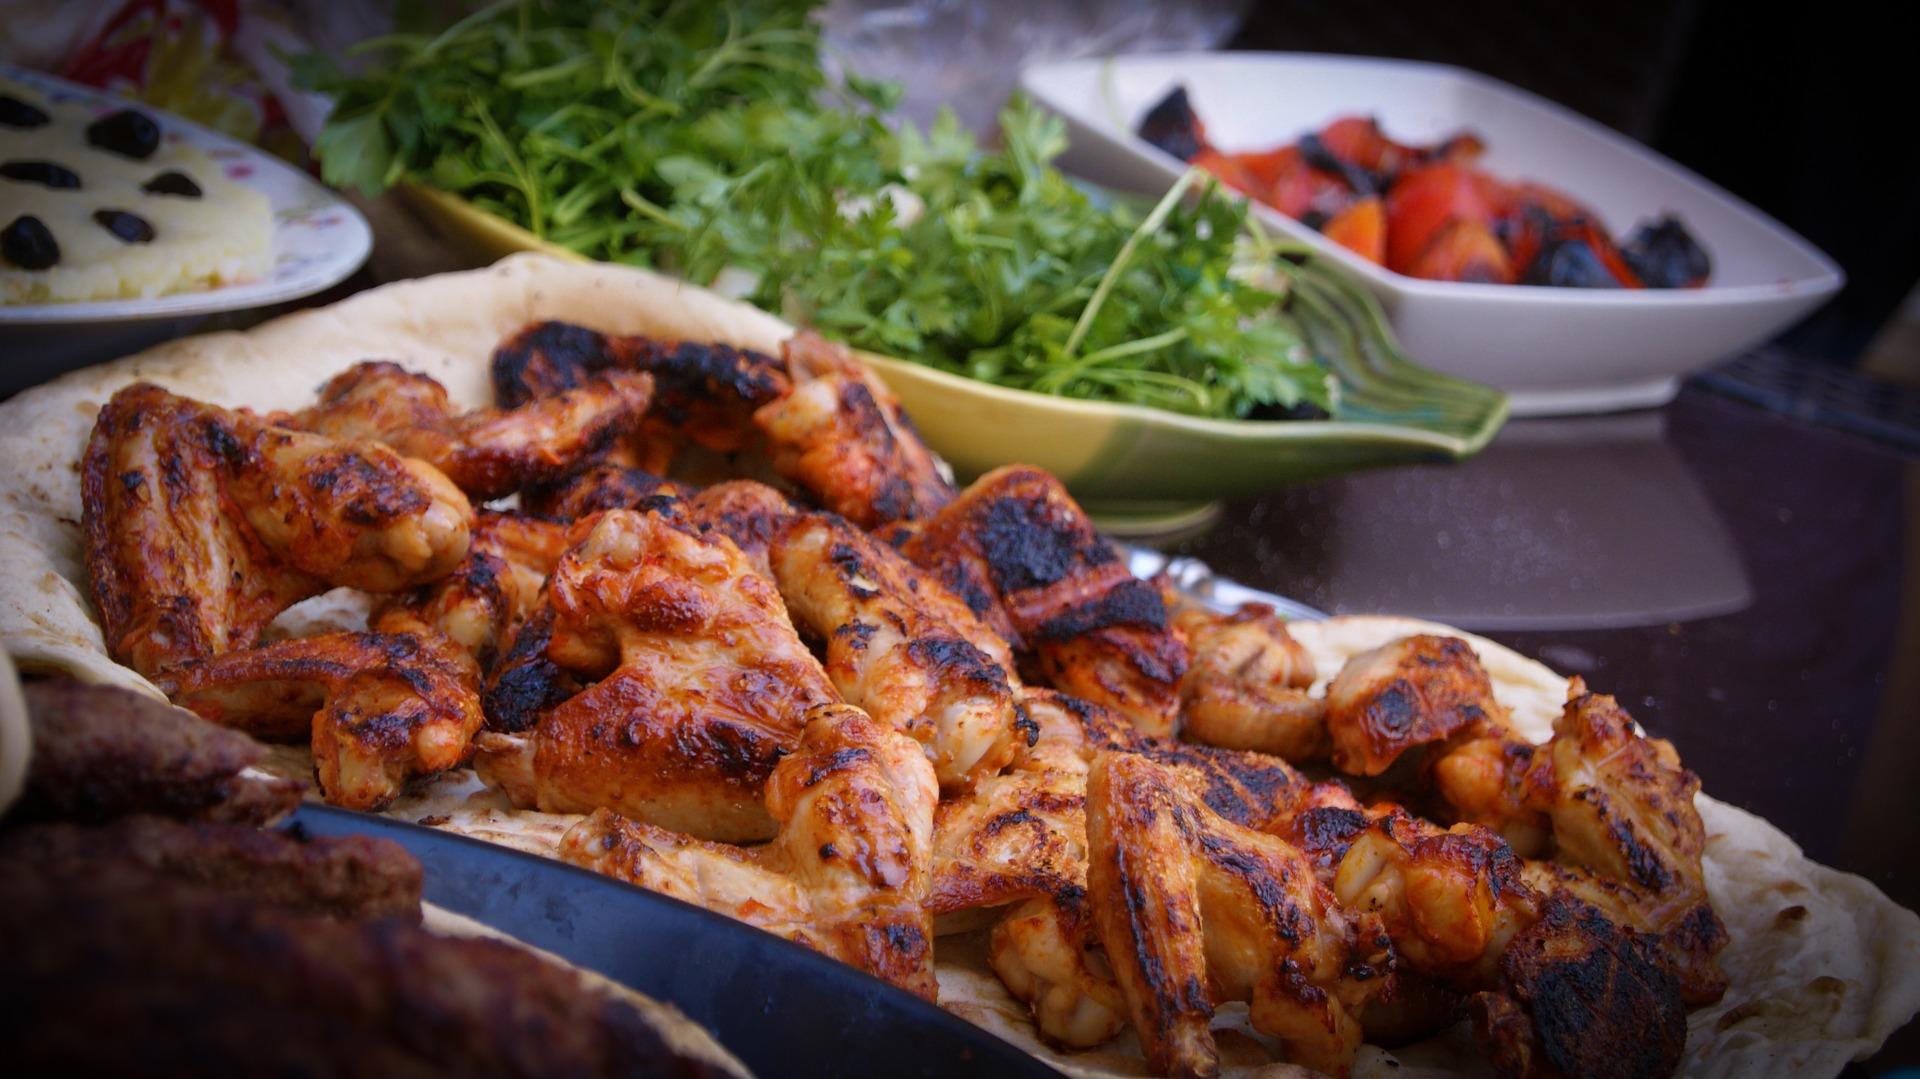 barbecue-1836053_1920.jpg